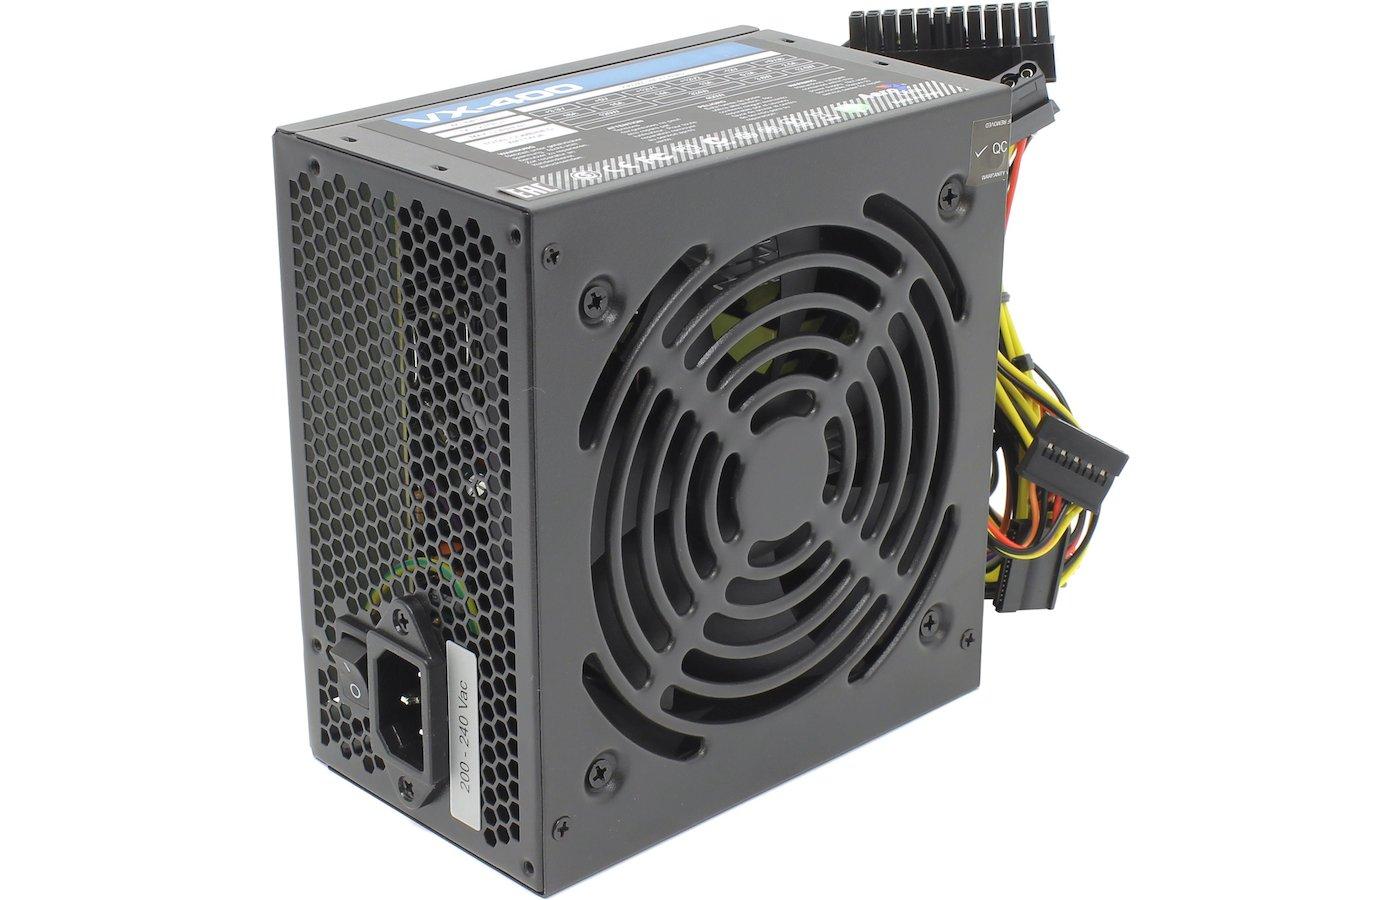 Блок питания Aerocool ATX 400W VX-400 (24+4+4pin) 120mm fan 2xSATA RTL